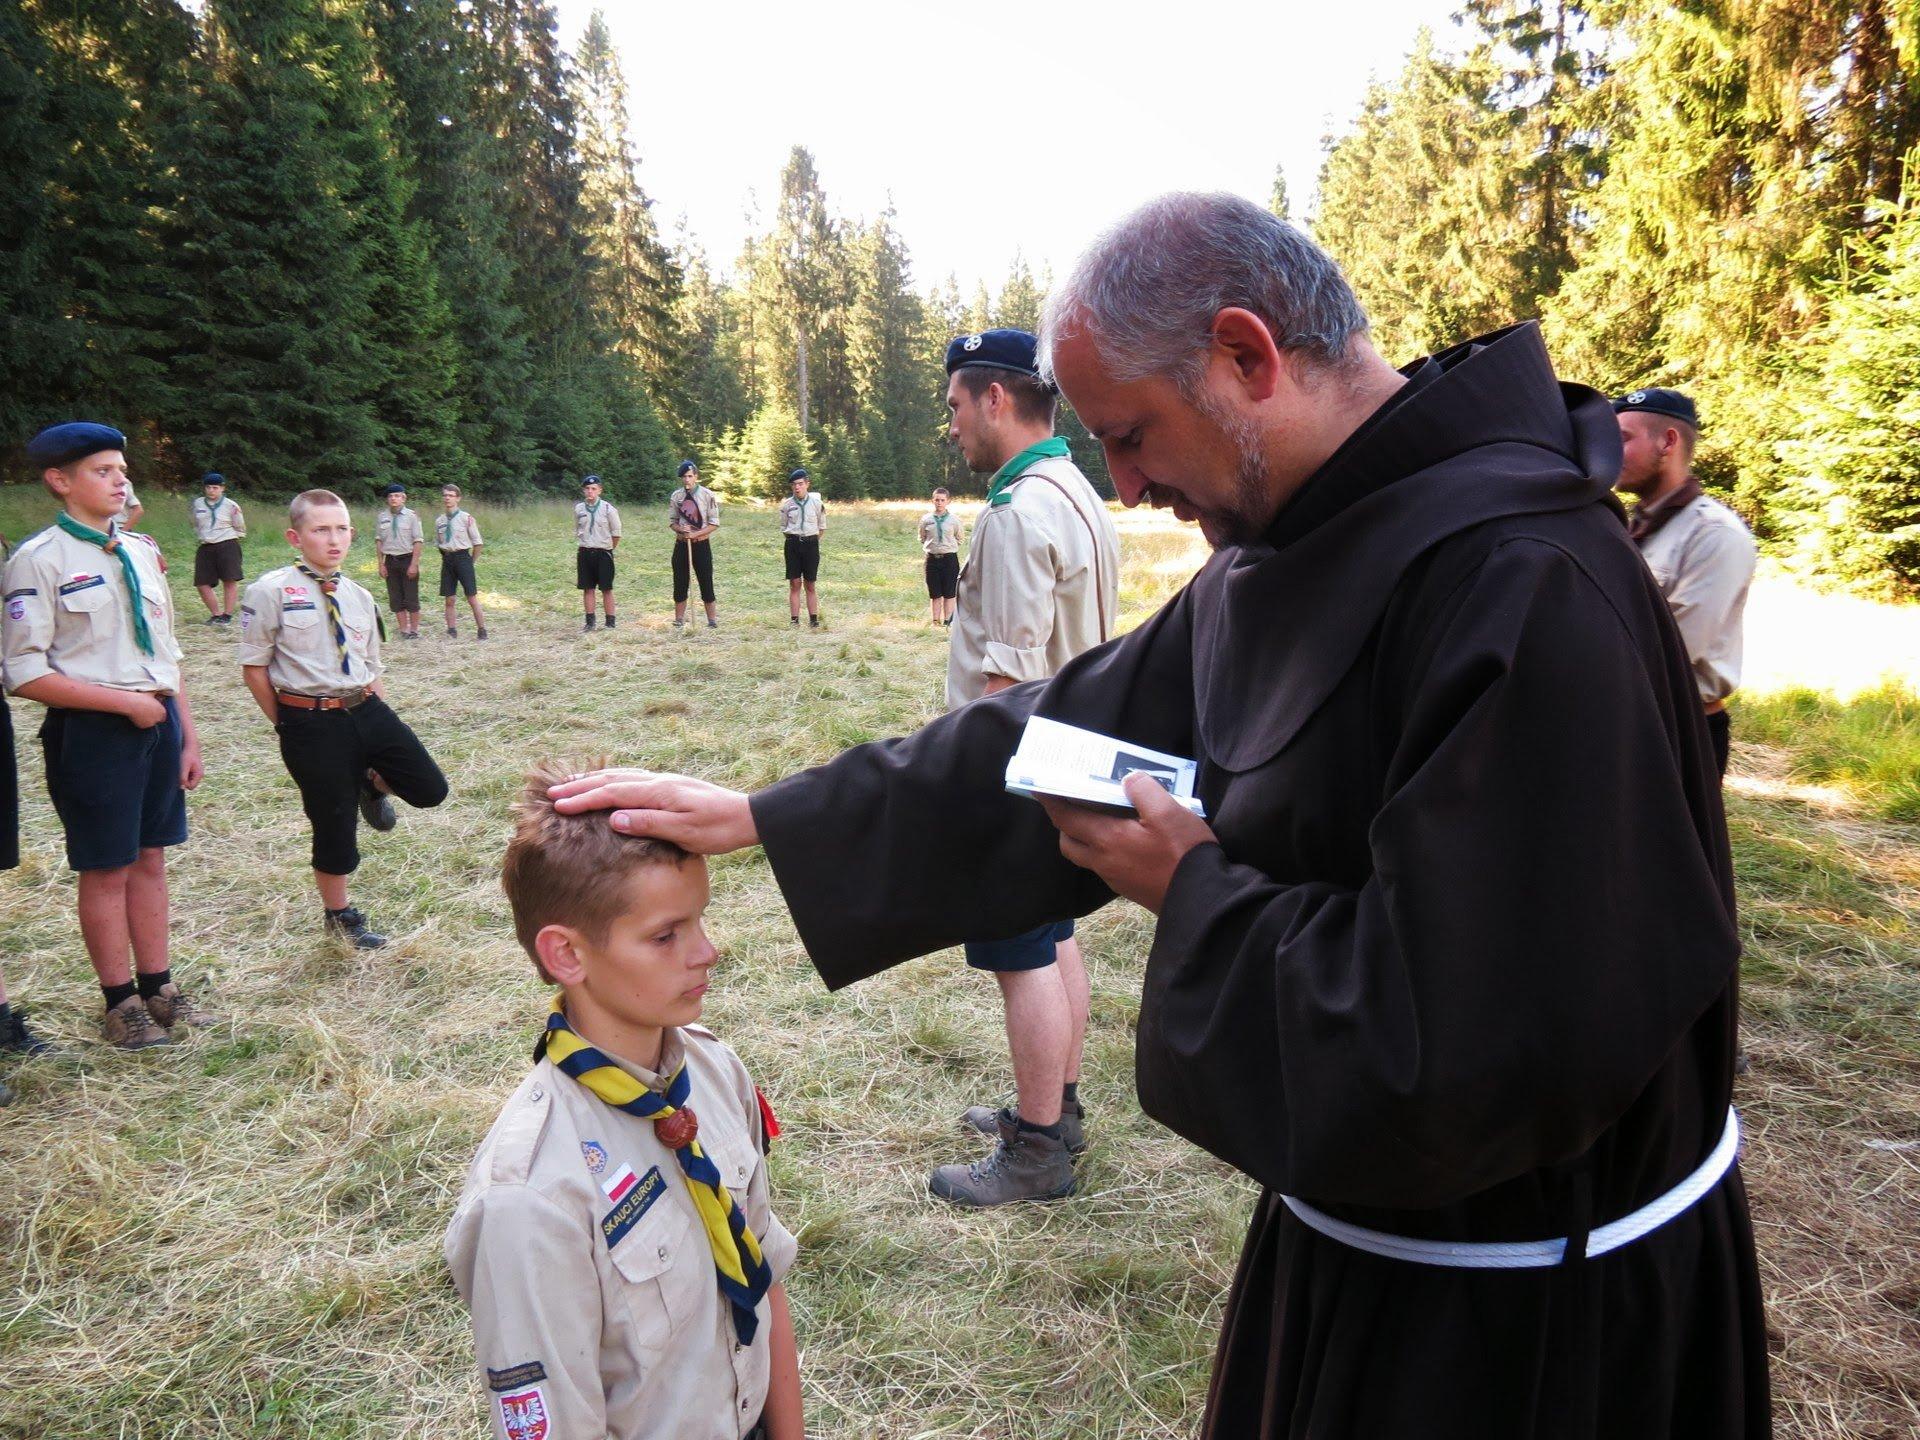 Franciscan friar blesses boy scout